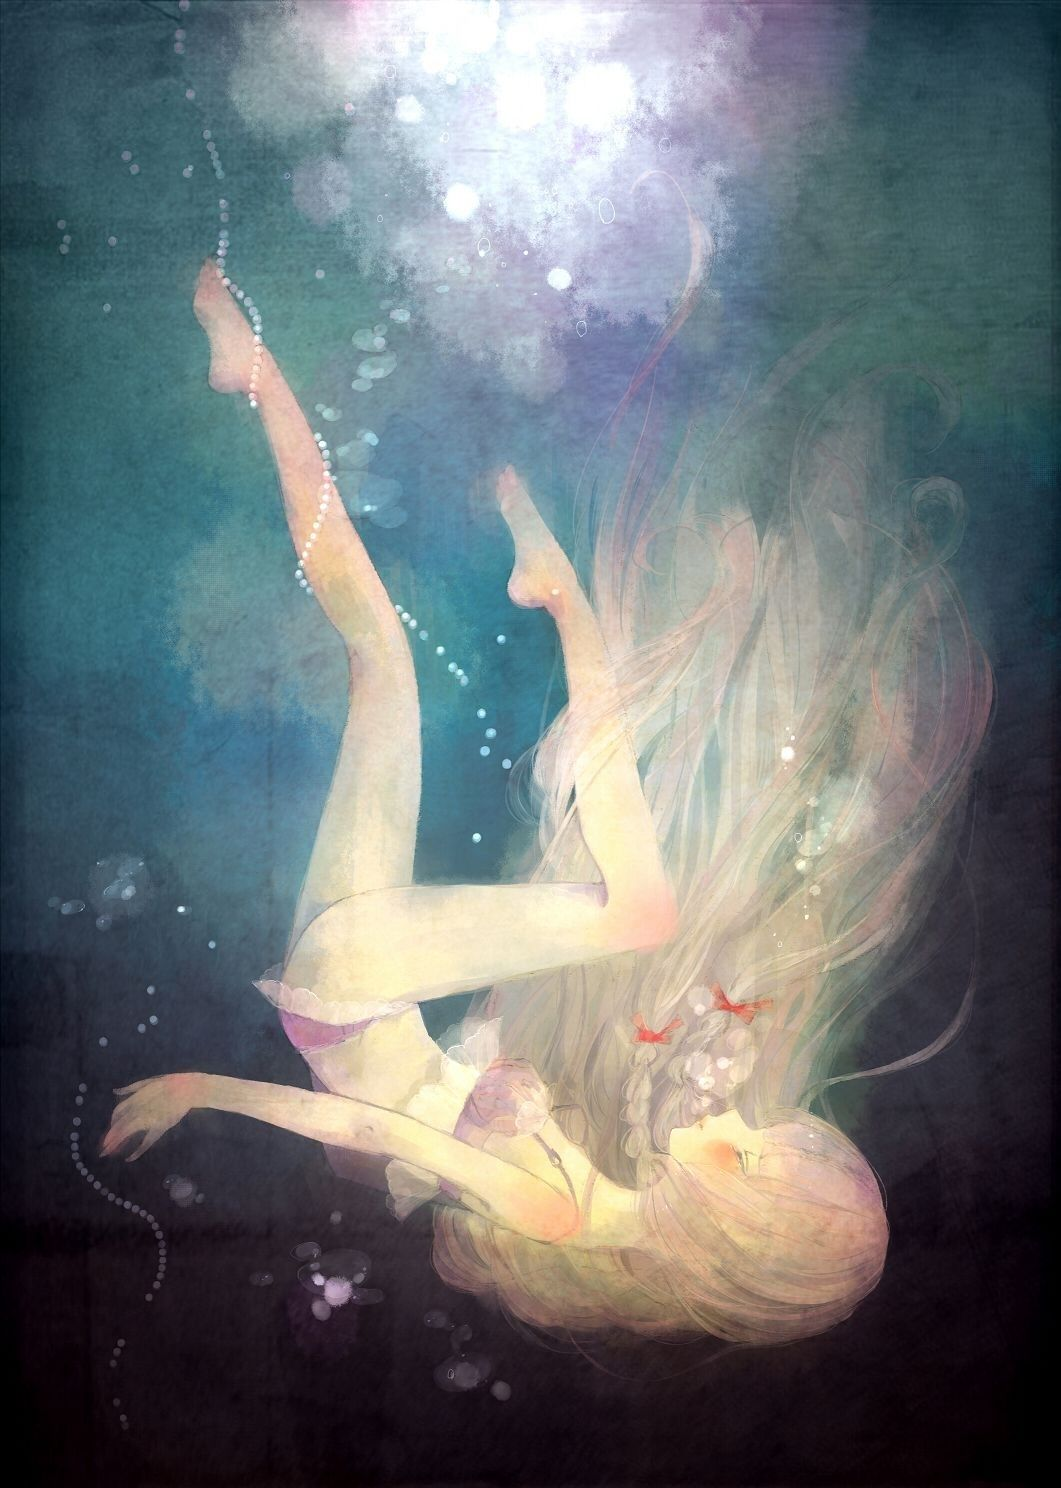 Girl Drowning In Water 青春是一段凛冽刻骨的浮光掠影